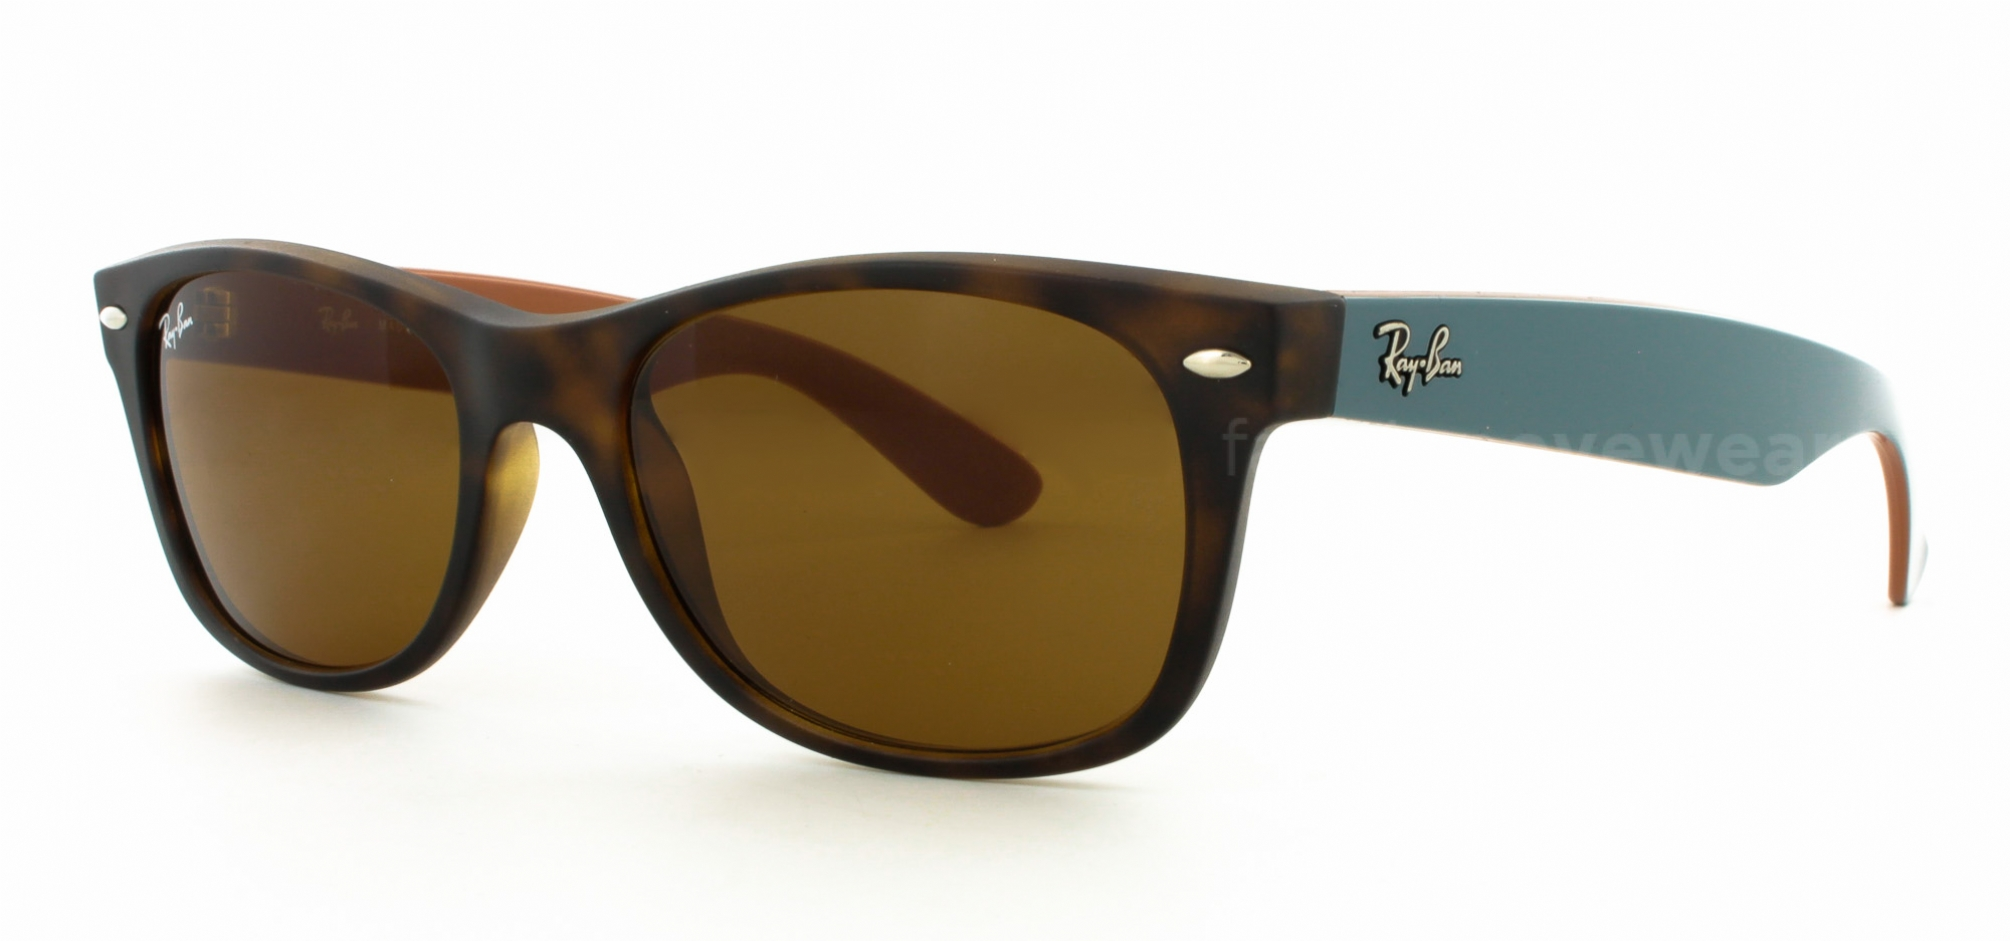 Buy Ray Ban Prescription Sunglasses Online Canada